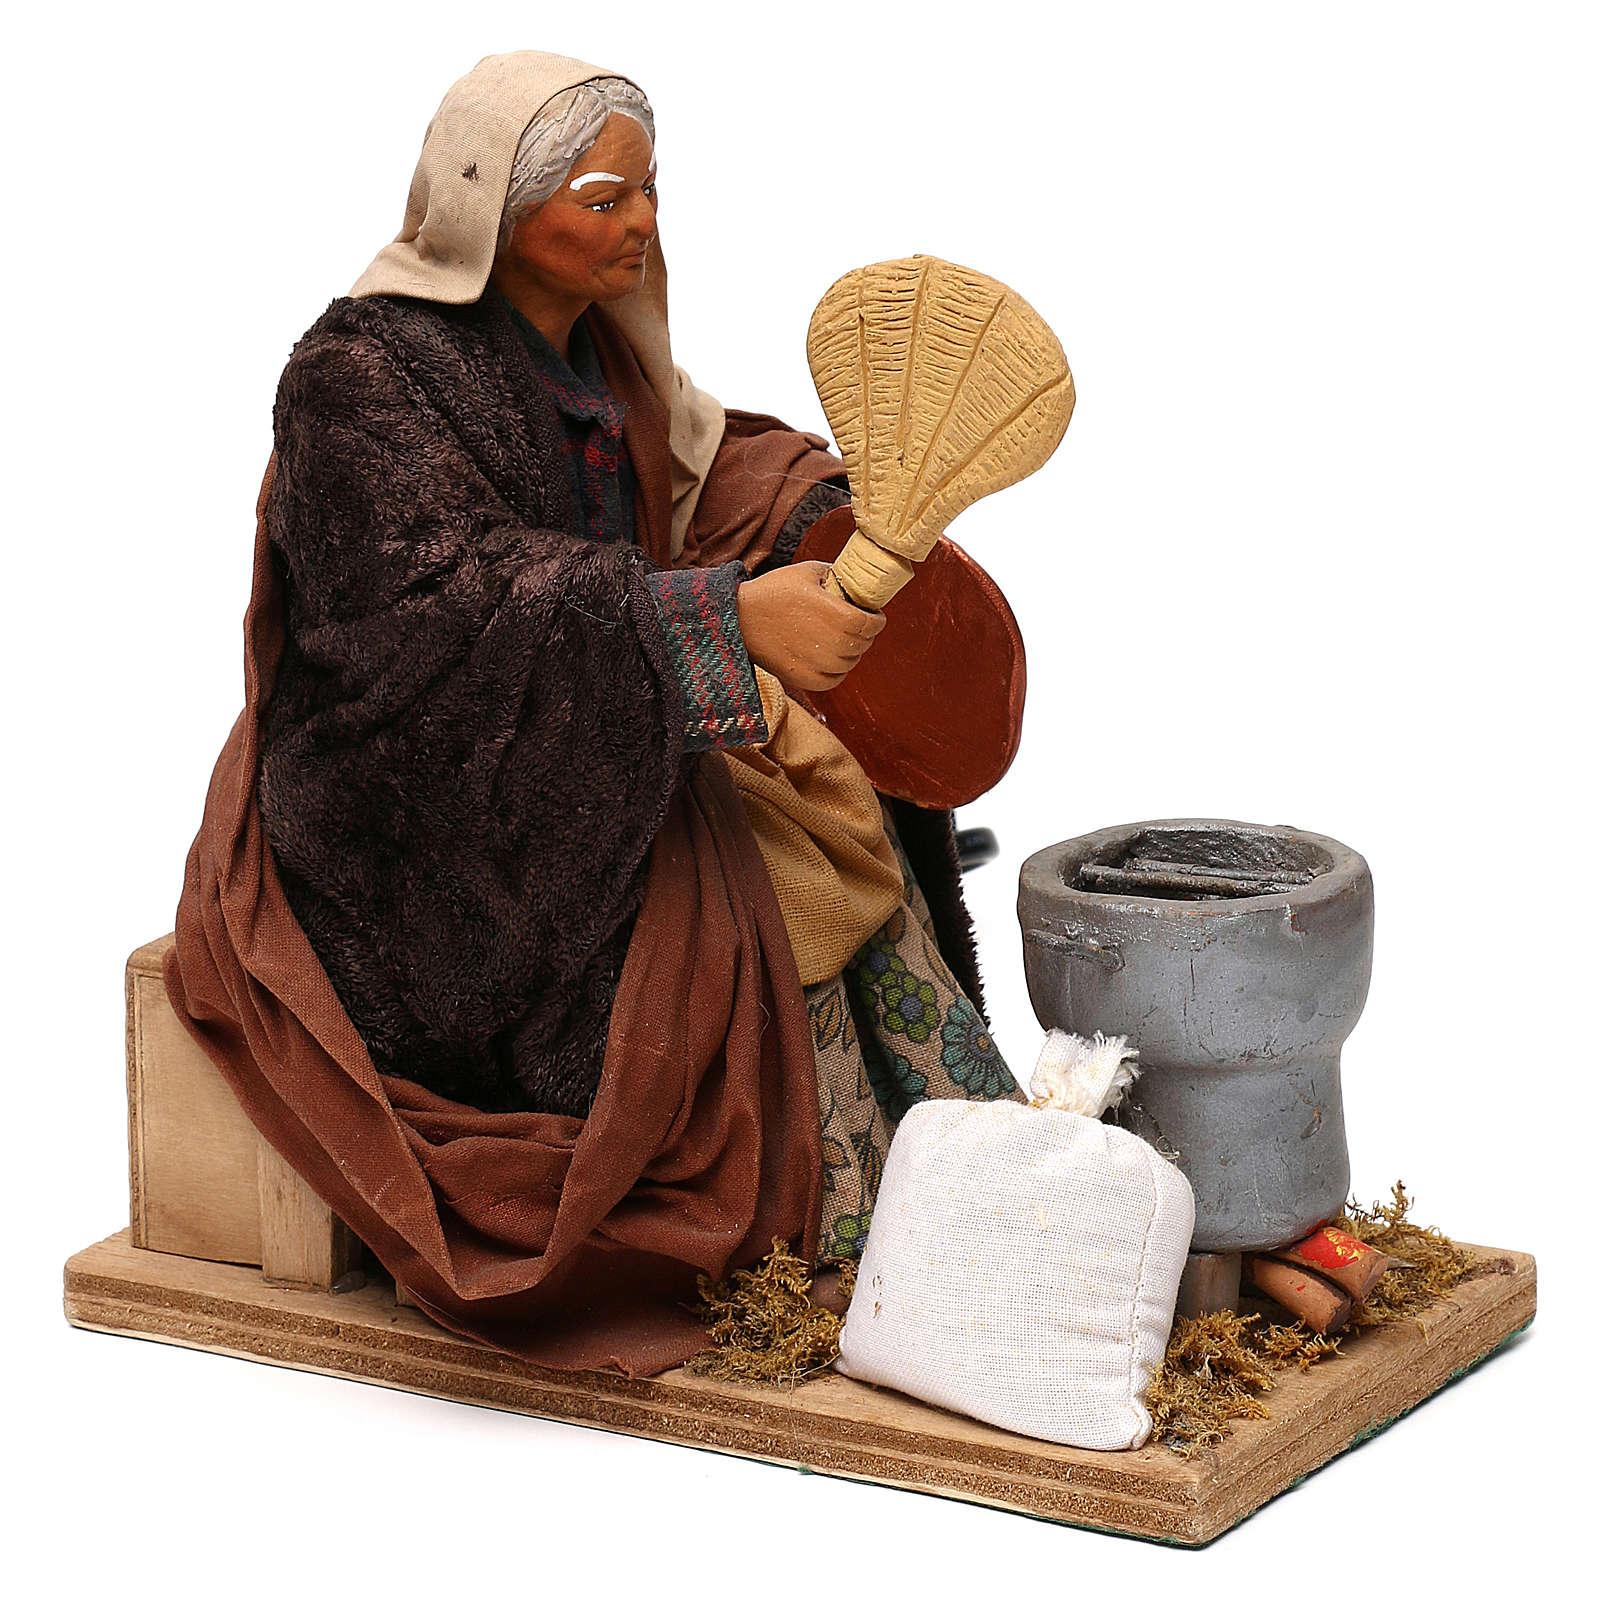 STOCK Mujer con abanico movimiento 24 cm belén napolitano 4